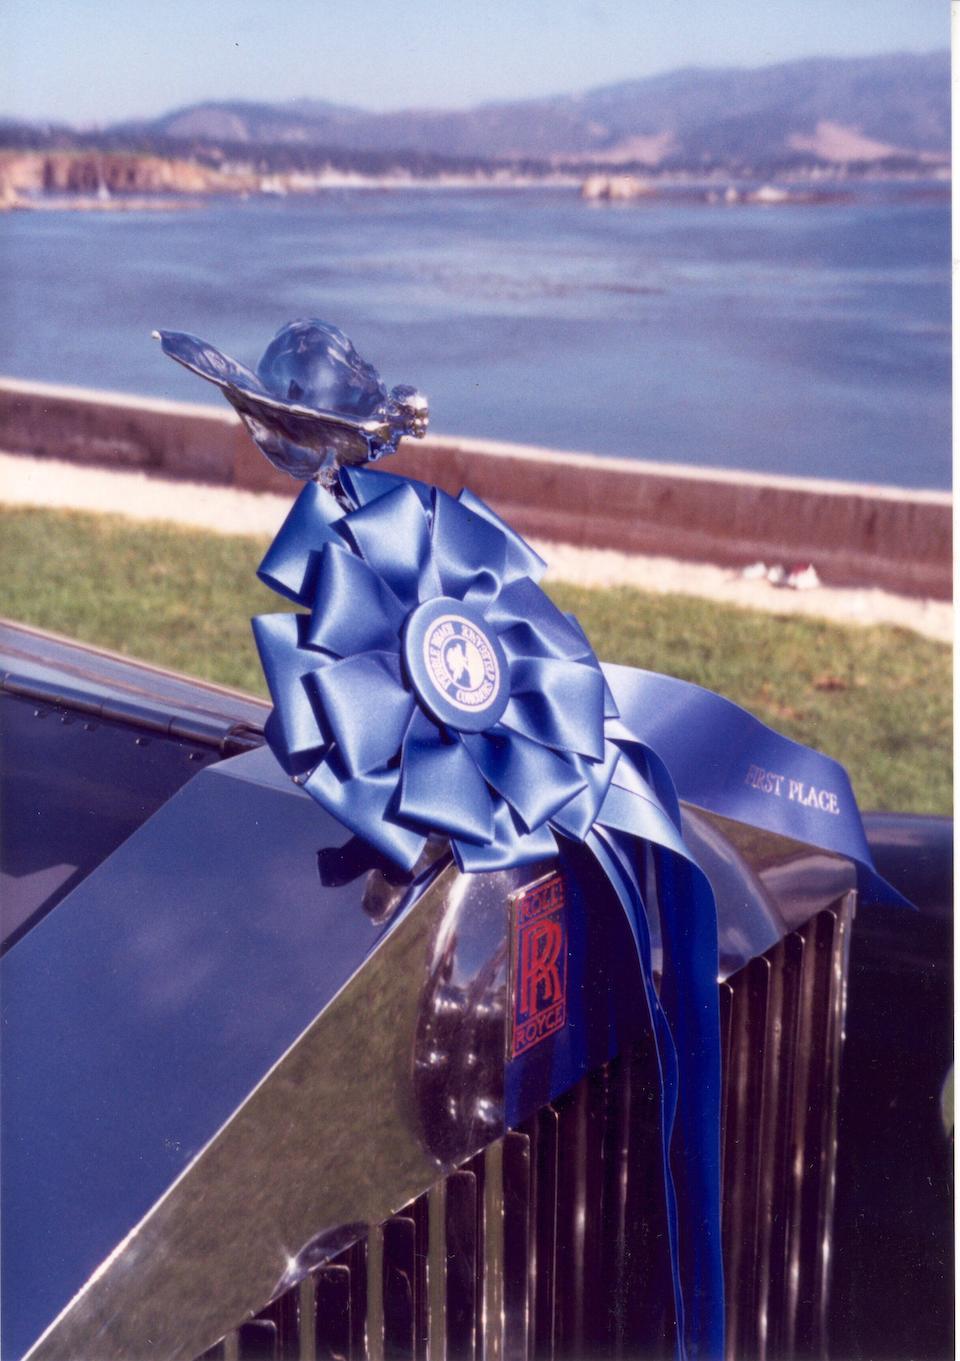 The property of Sir John Stuttard, Lord Mayor of London, 2006-2007.  1994 Pebble Beach Concours d'Élégance Class Winner.  1996 Masters Class Winner, RREC Annual Rally, Althorp Park,,1931 Rolls-Royce Phantom II Continental Touring Saloon  Chassis no. 50GX Engine no. KA95